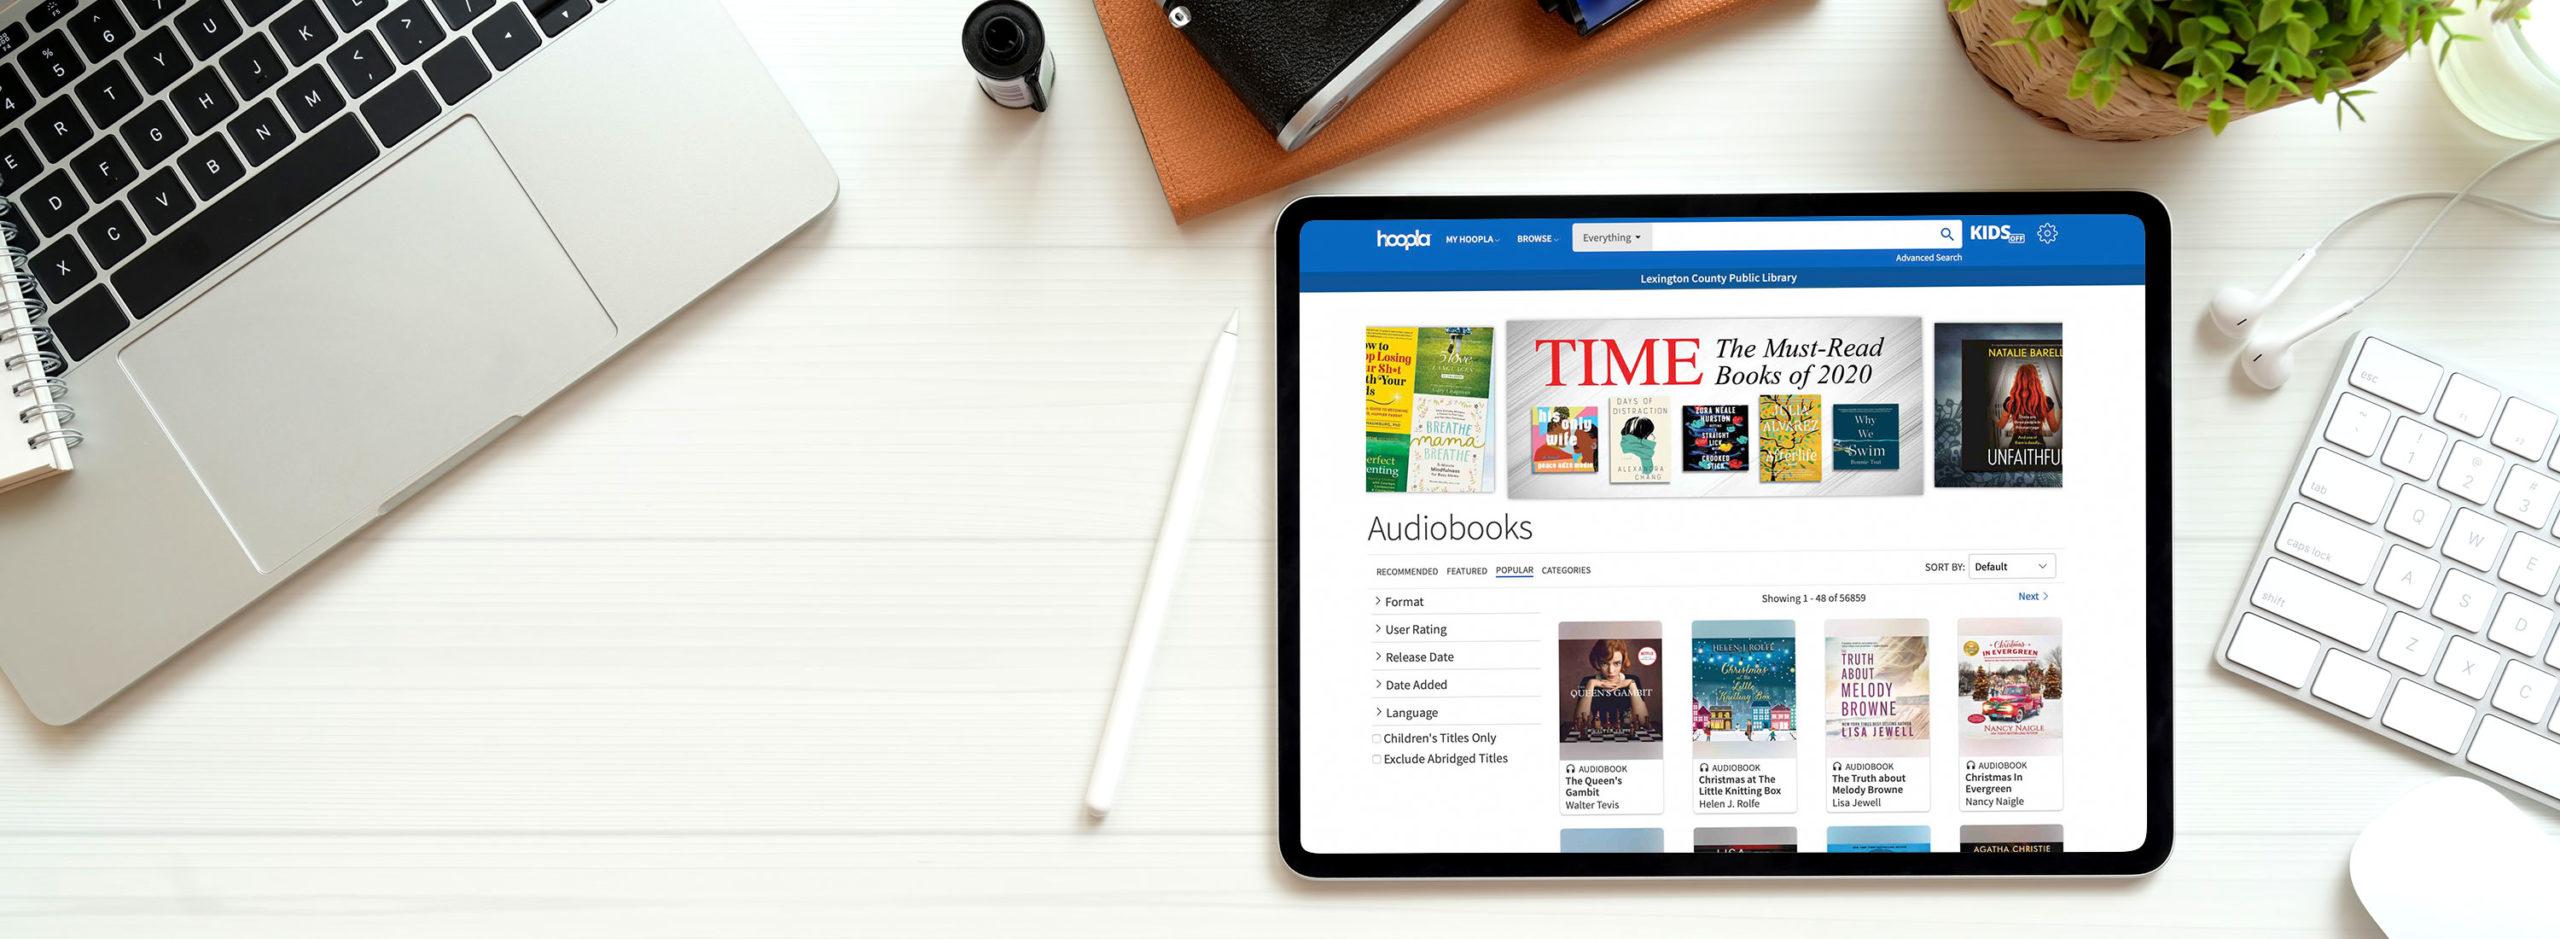 digital downloads: ebooks, audiobooks, magazines